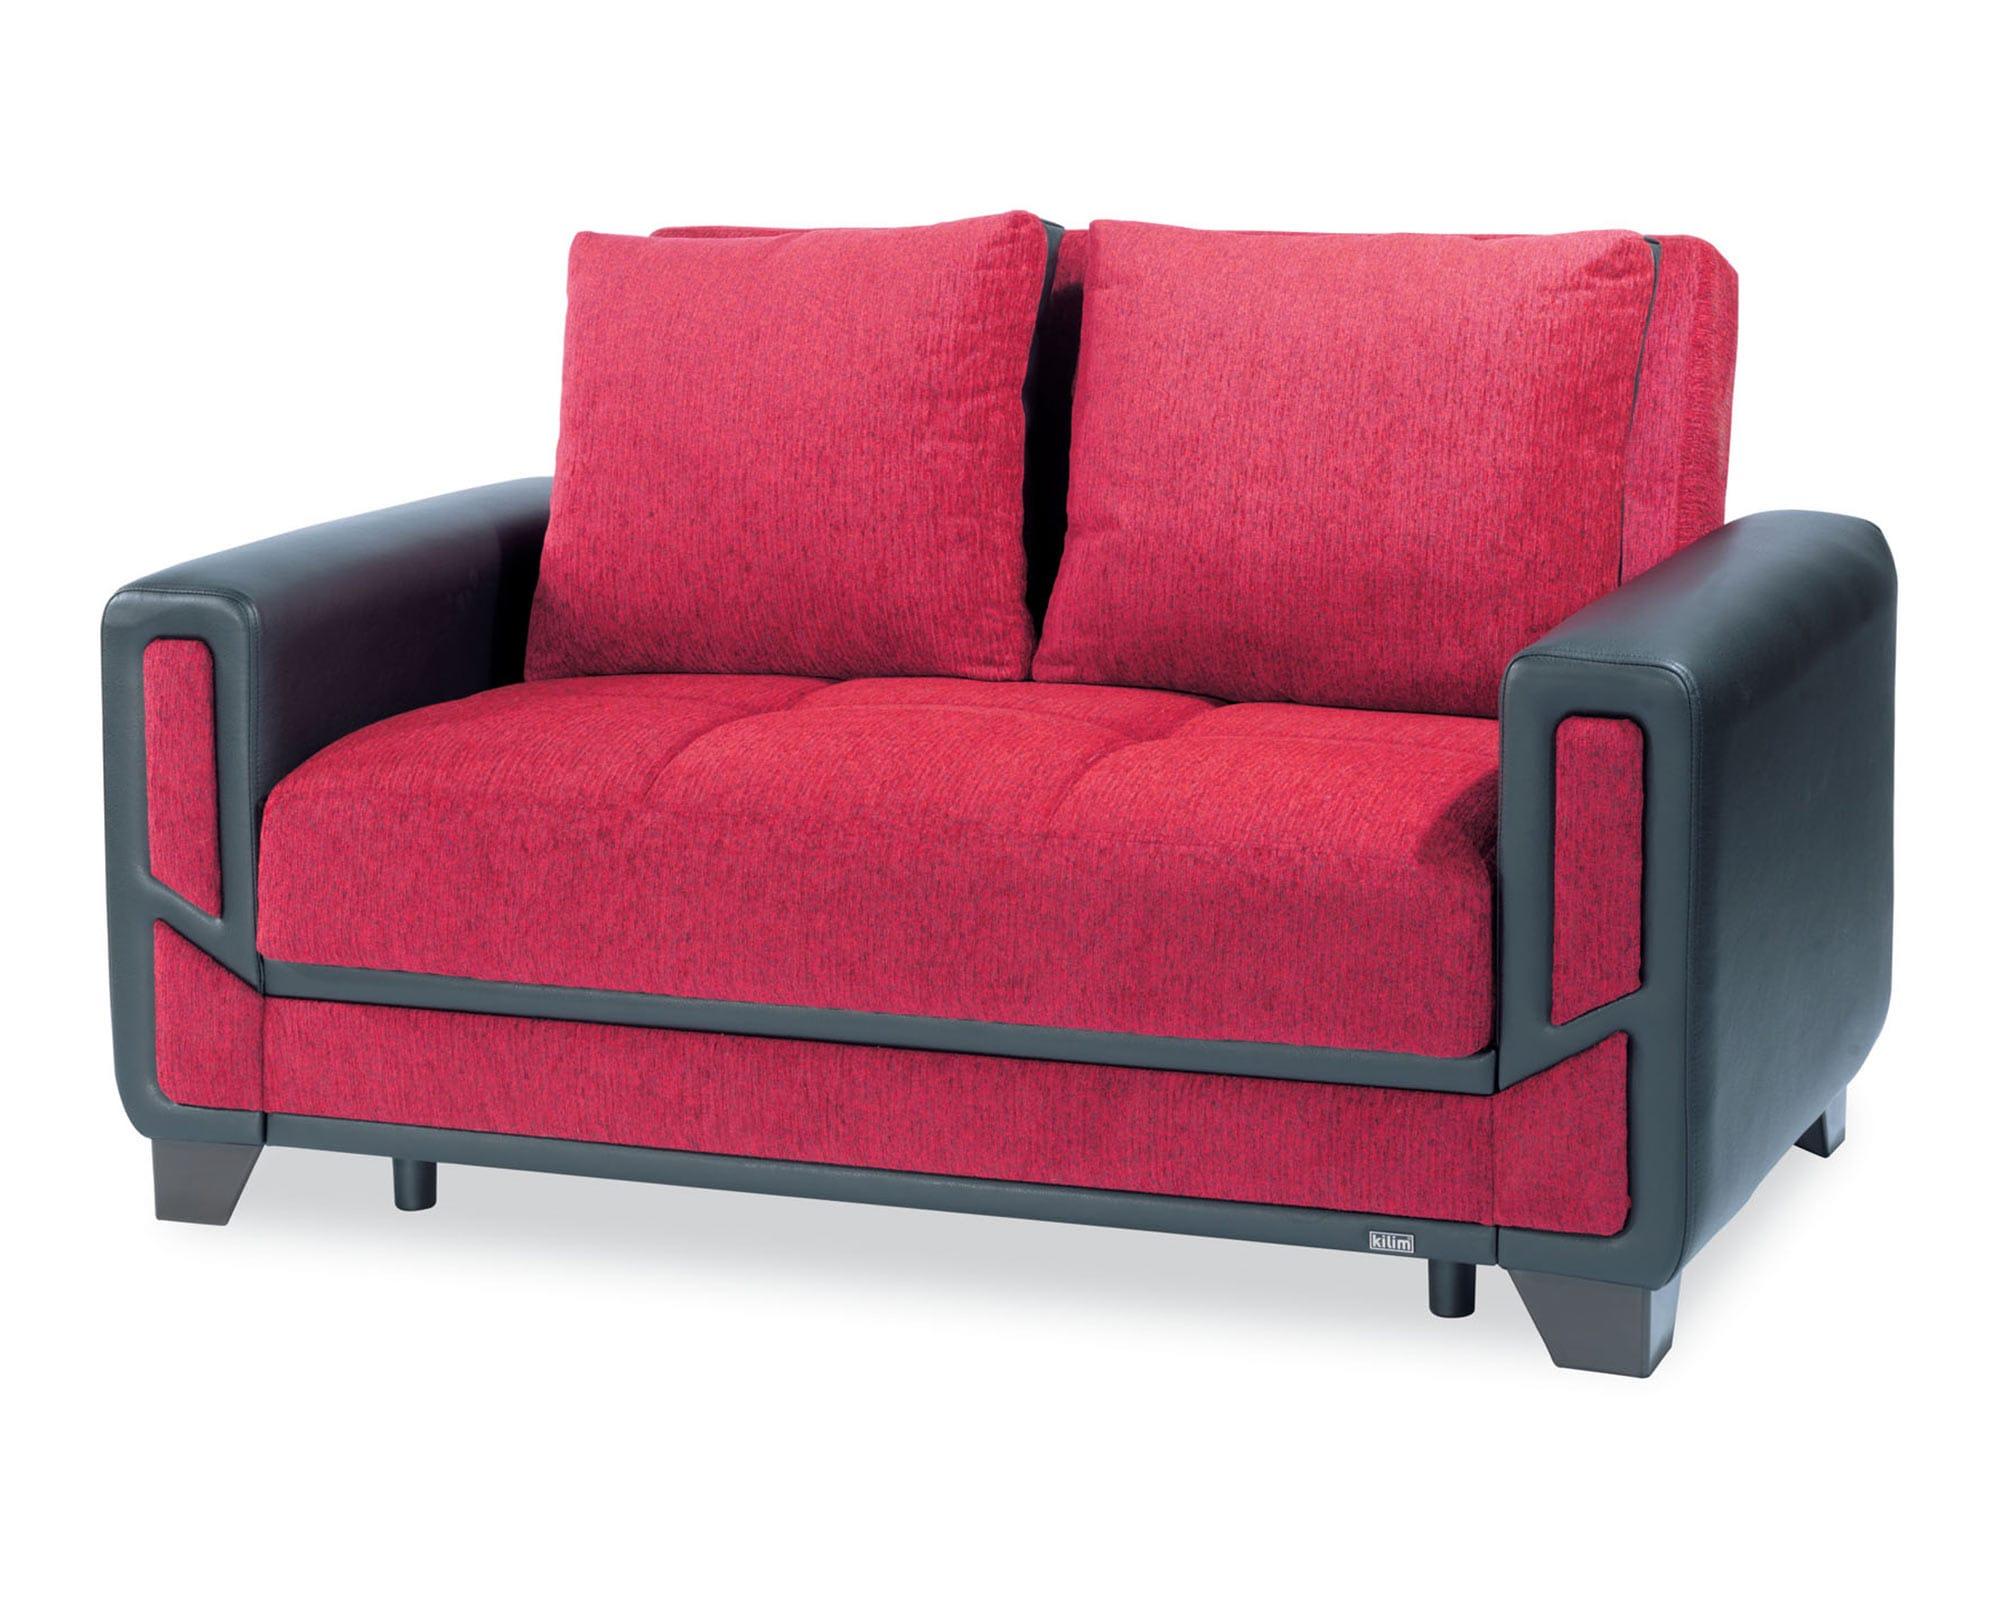 Mondo Modern Red Convertible Loveseat By Casamode